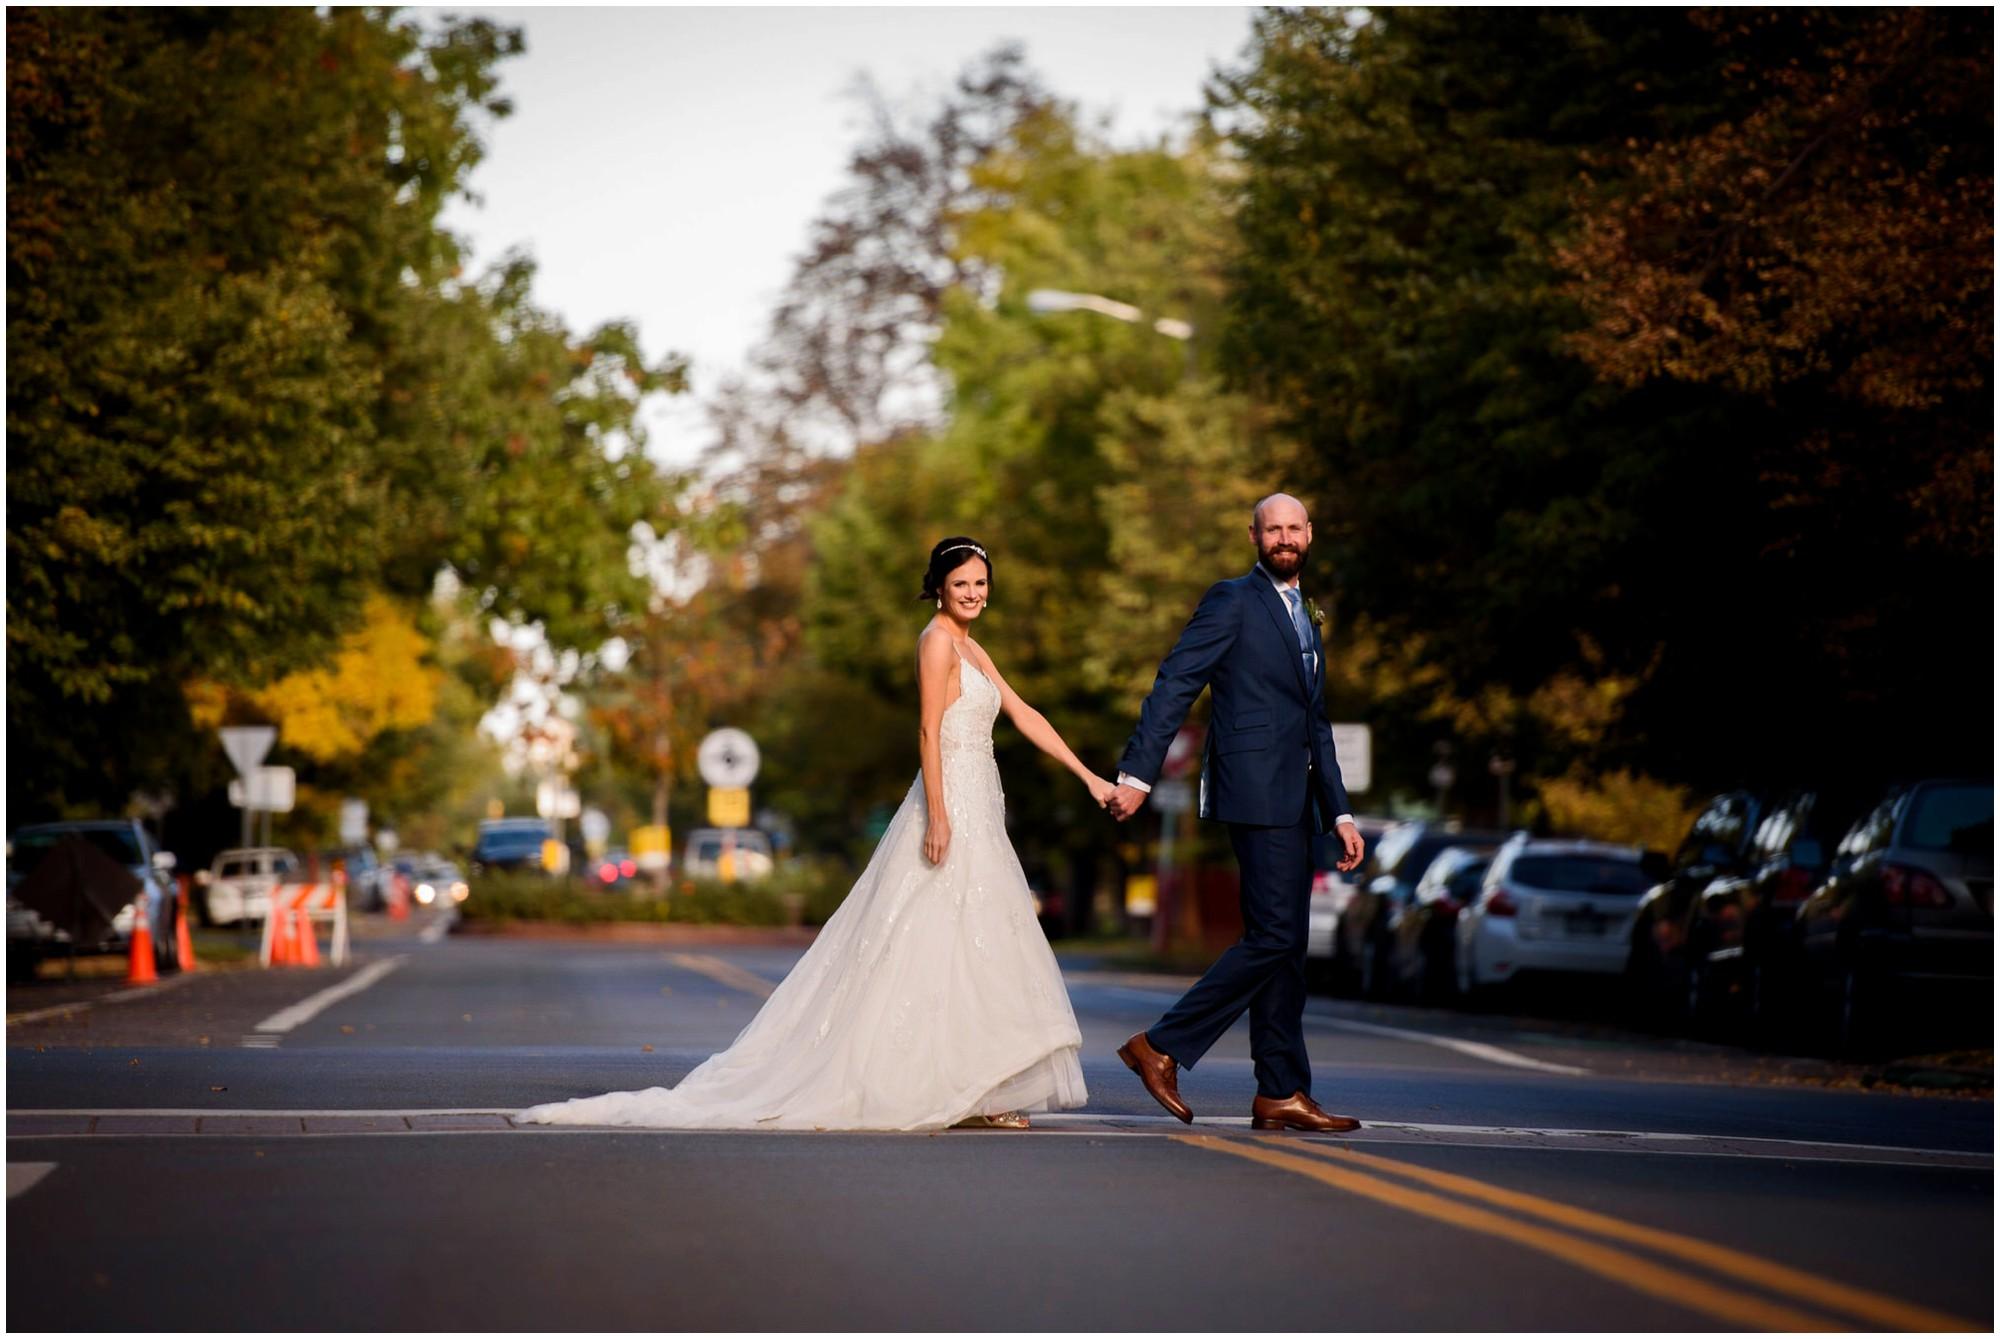 726-Boulder-Colorado-Fall-wedding-photography-king.jpg